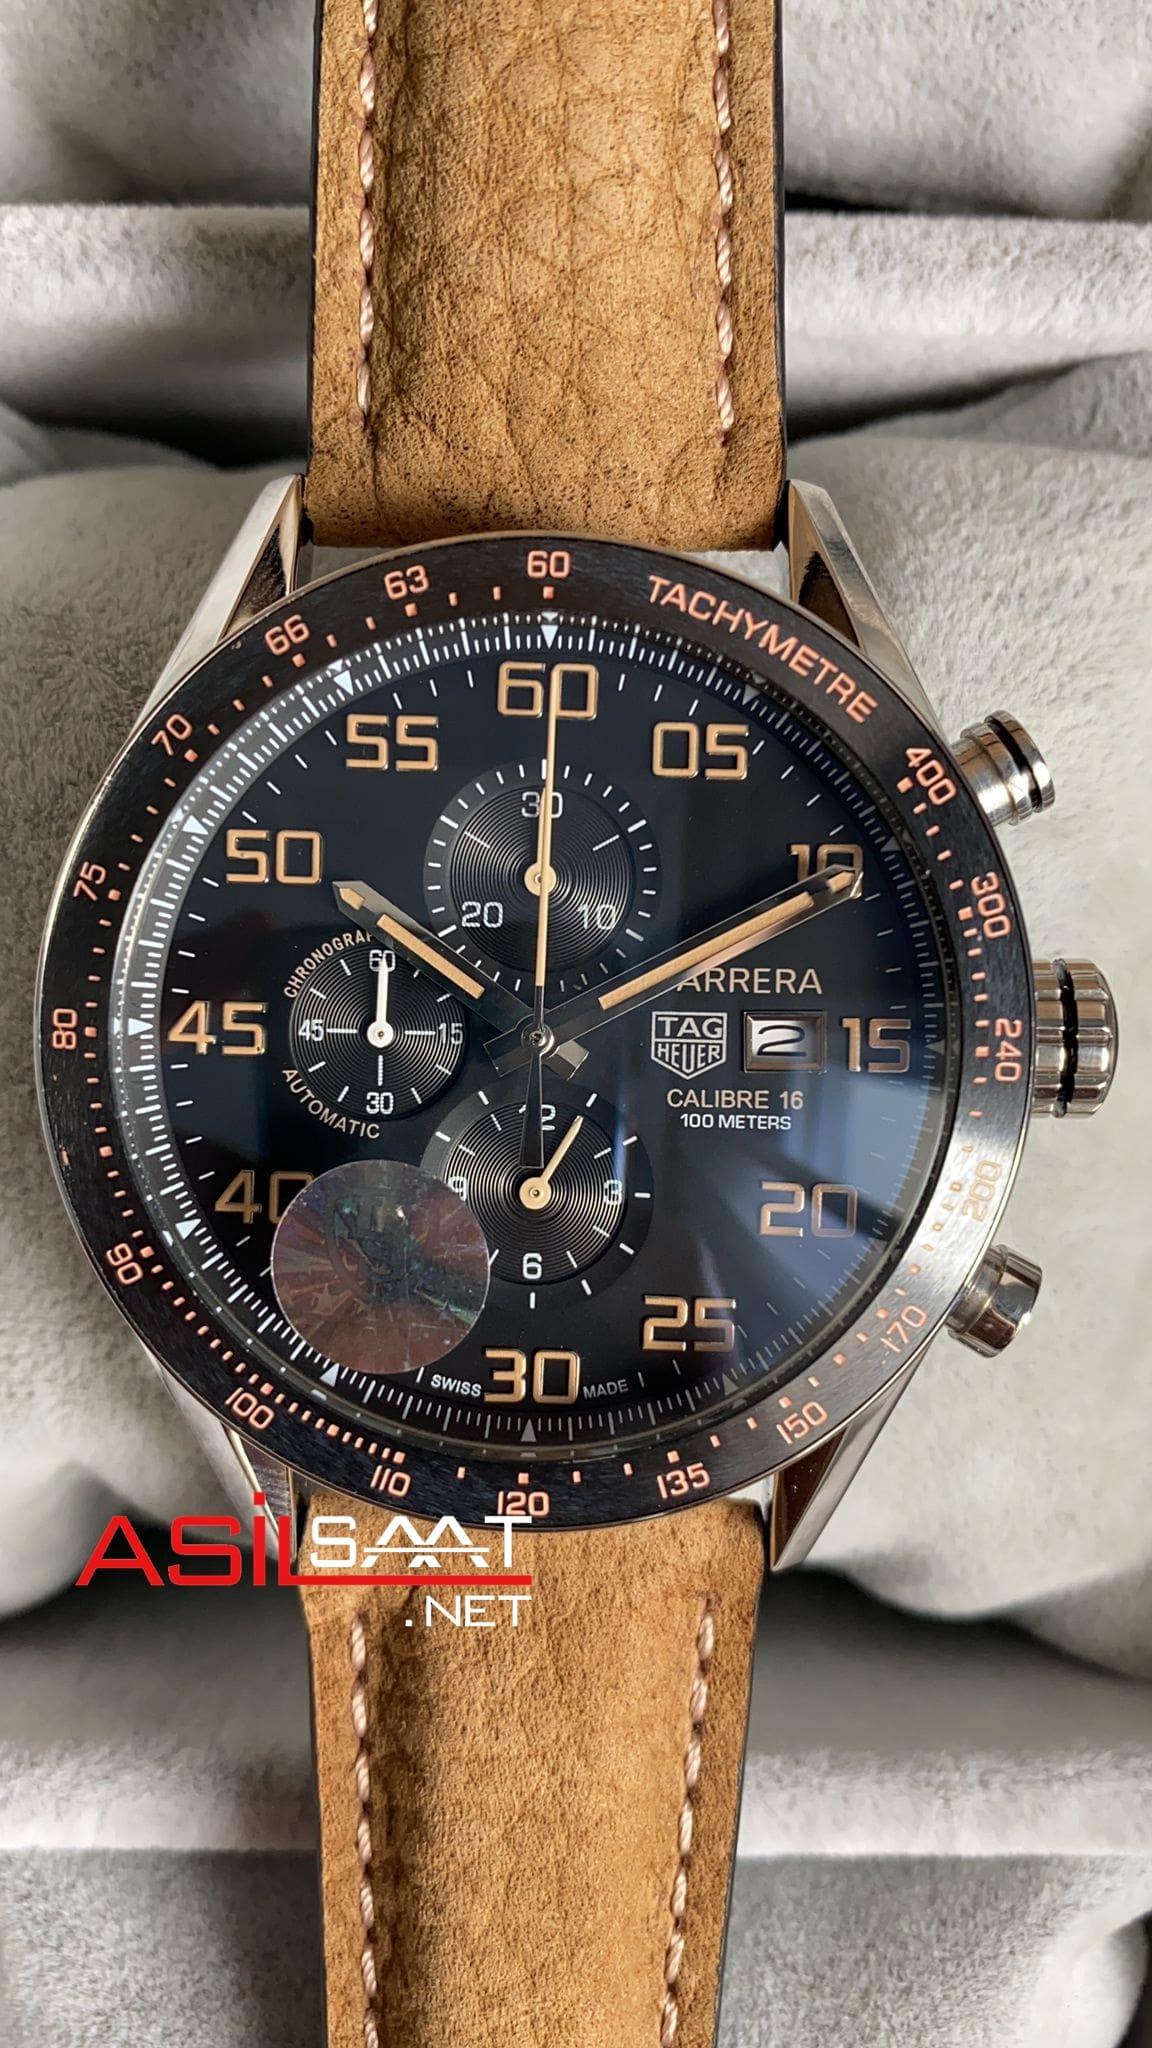 TAG Heuer Carrera Calibre16 Silver Chronograph Replika Saat TAGC16006